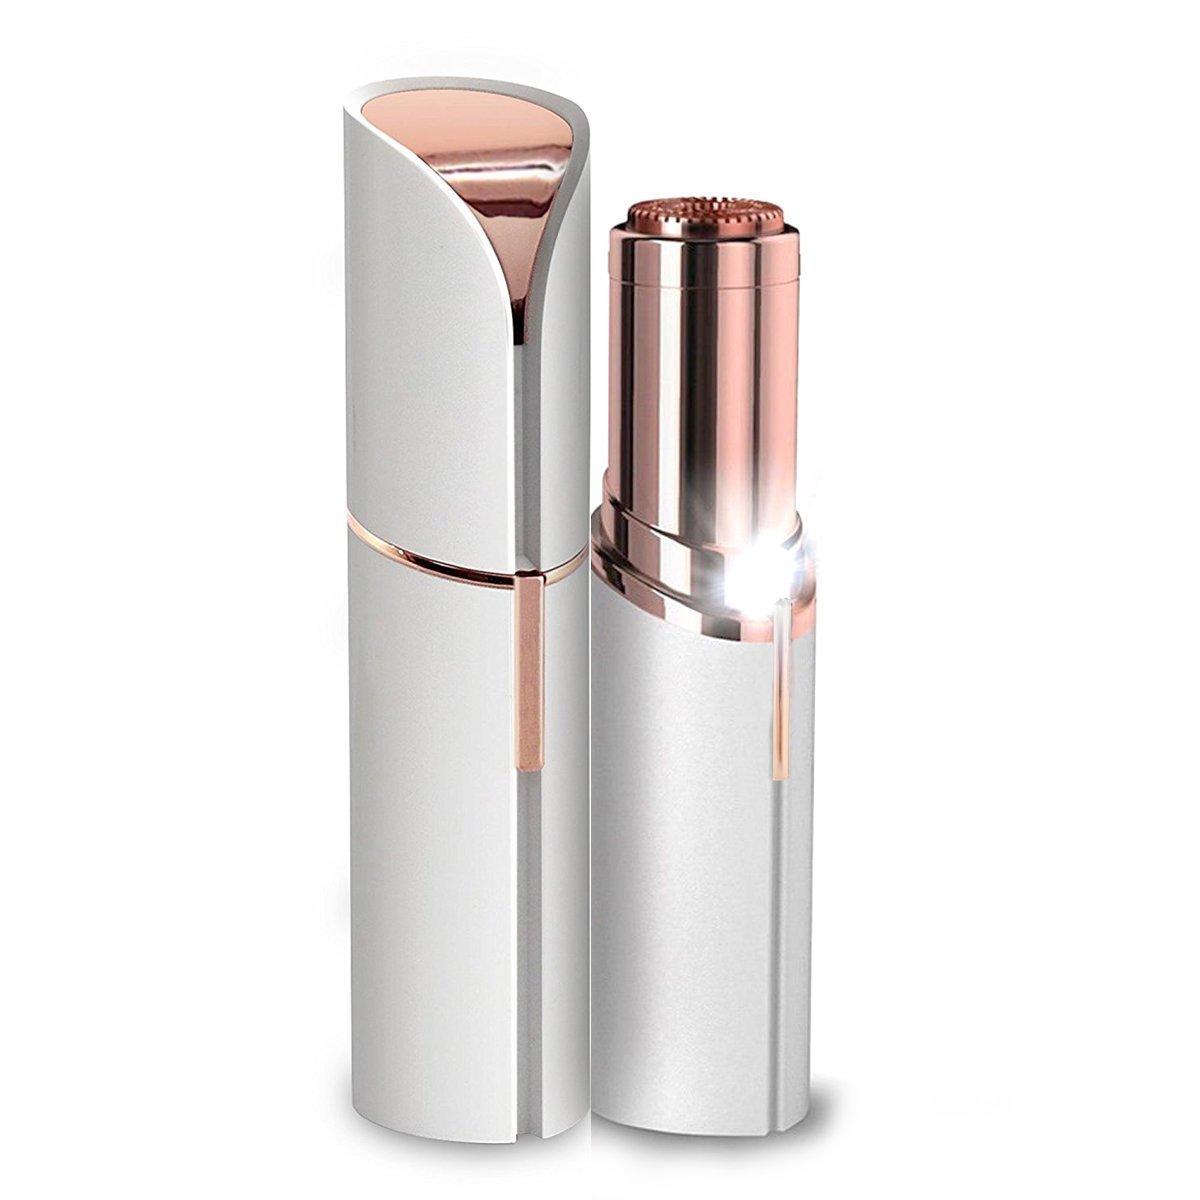 Painless Facial Hair Removal Ladies Lipstick Shaving Device Built in Light Electric Cordless Facial Hair Razor Bikini Trimmer on Upper Lip Chin Cheeks (White) Abrlrdls